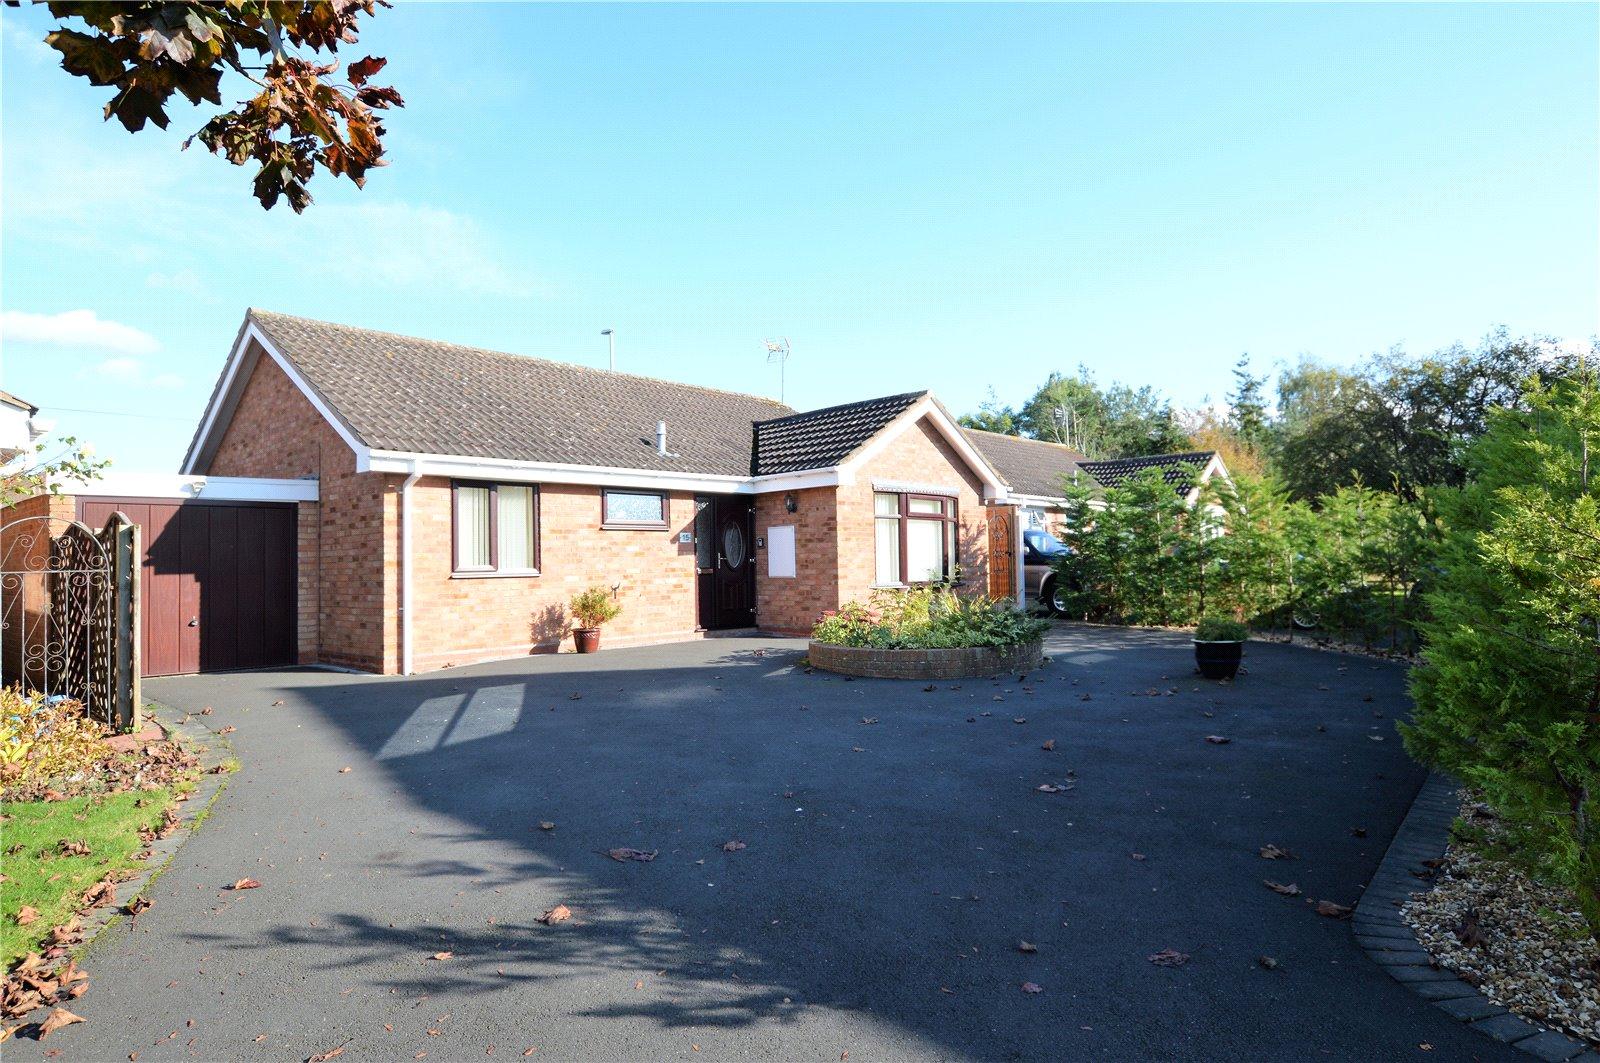 15 Mallards Close, Alveley, Bridgnorth, Shropshire, WV15